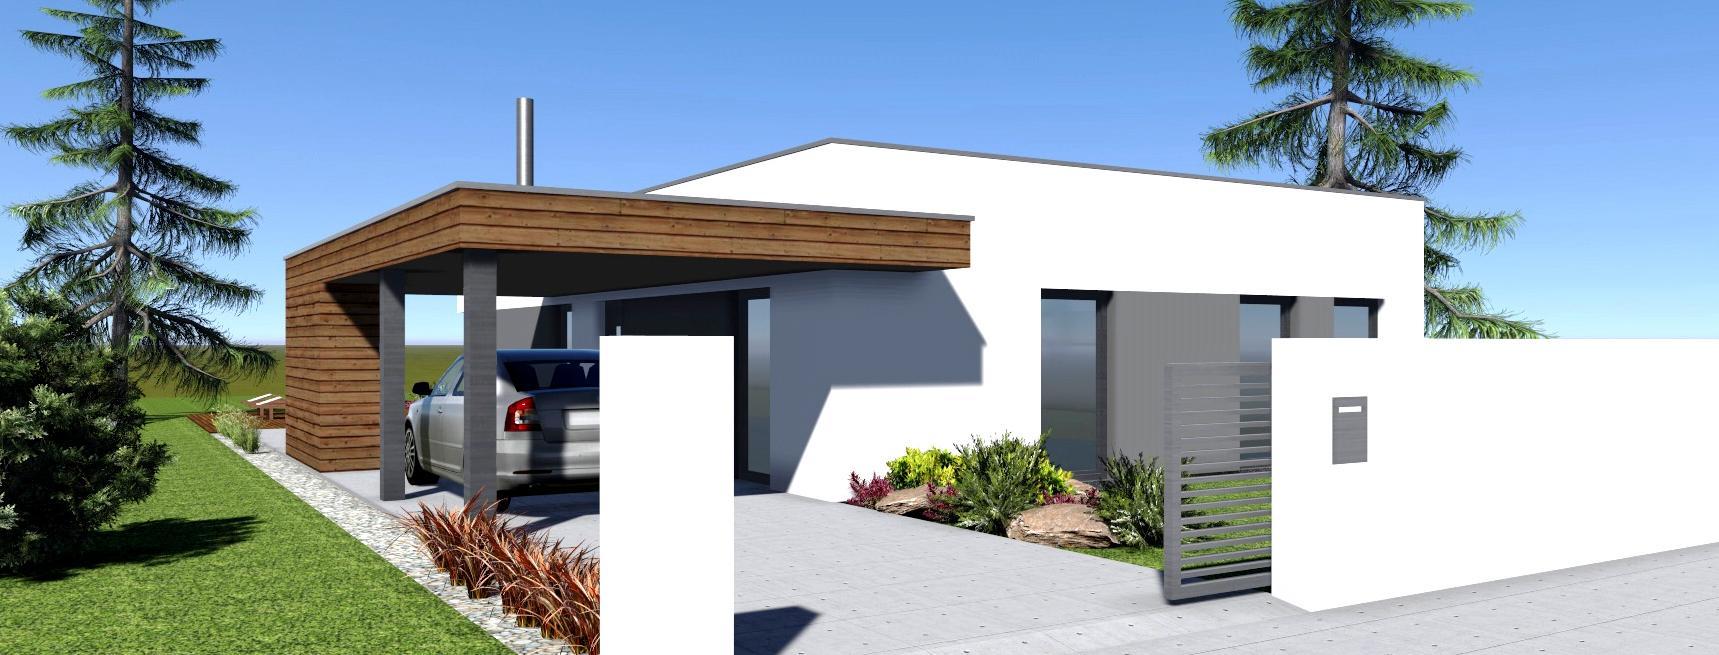 Dom - Obrázok č. 108